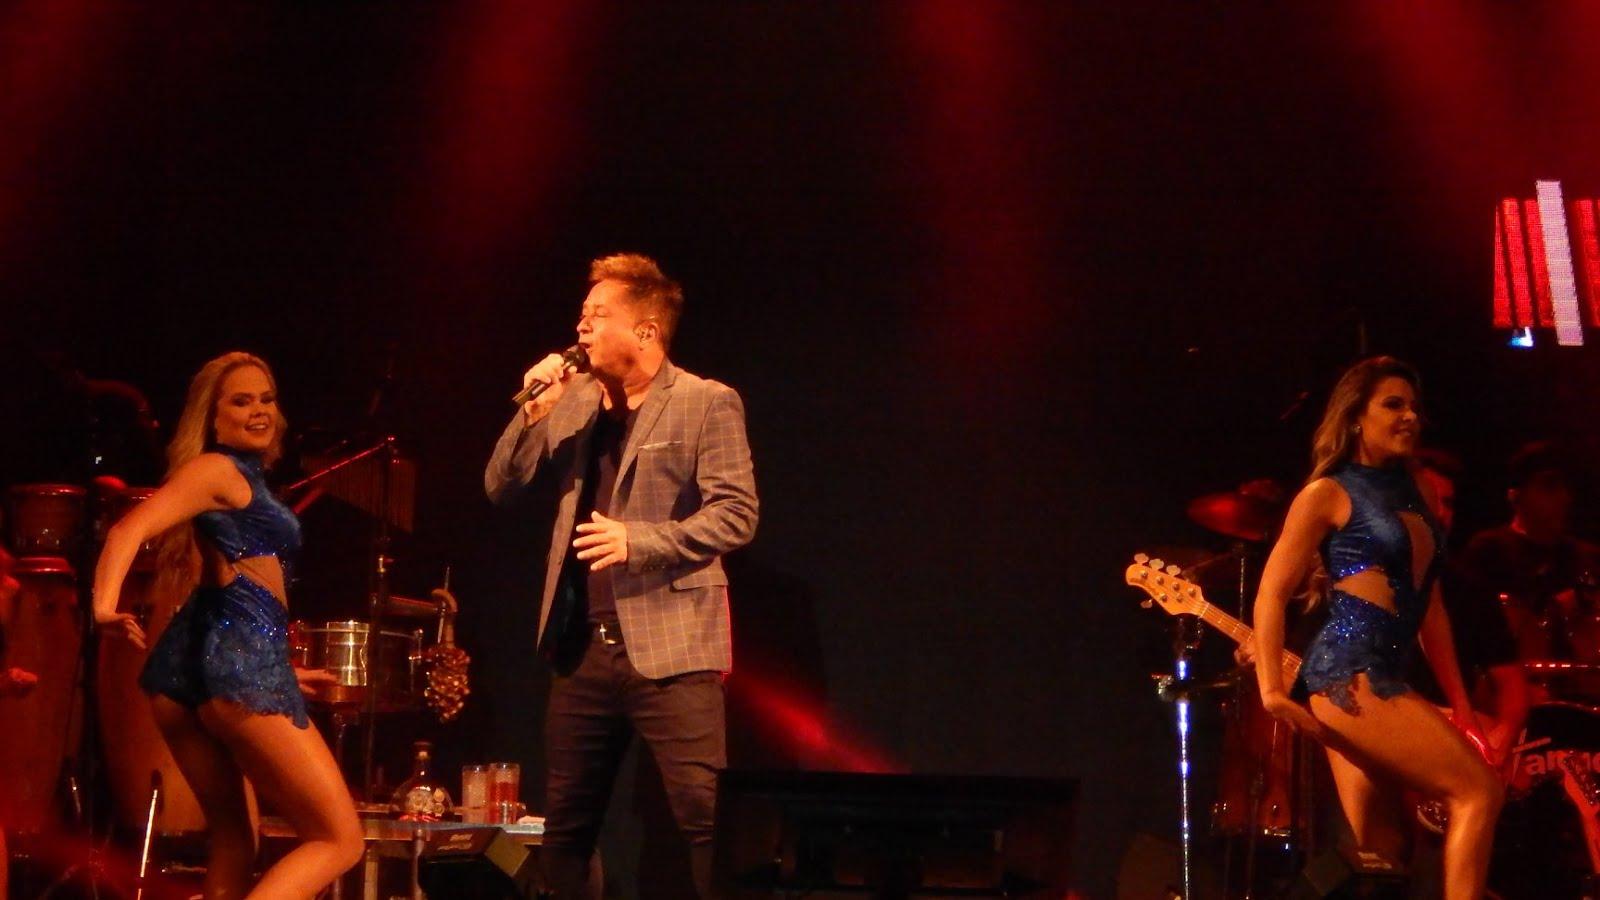 Turnê Canto Bebo E Choro🍷🍷 Leonardo em  MANDAGUARI/PR12/10/2018